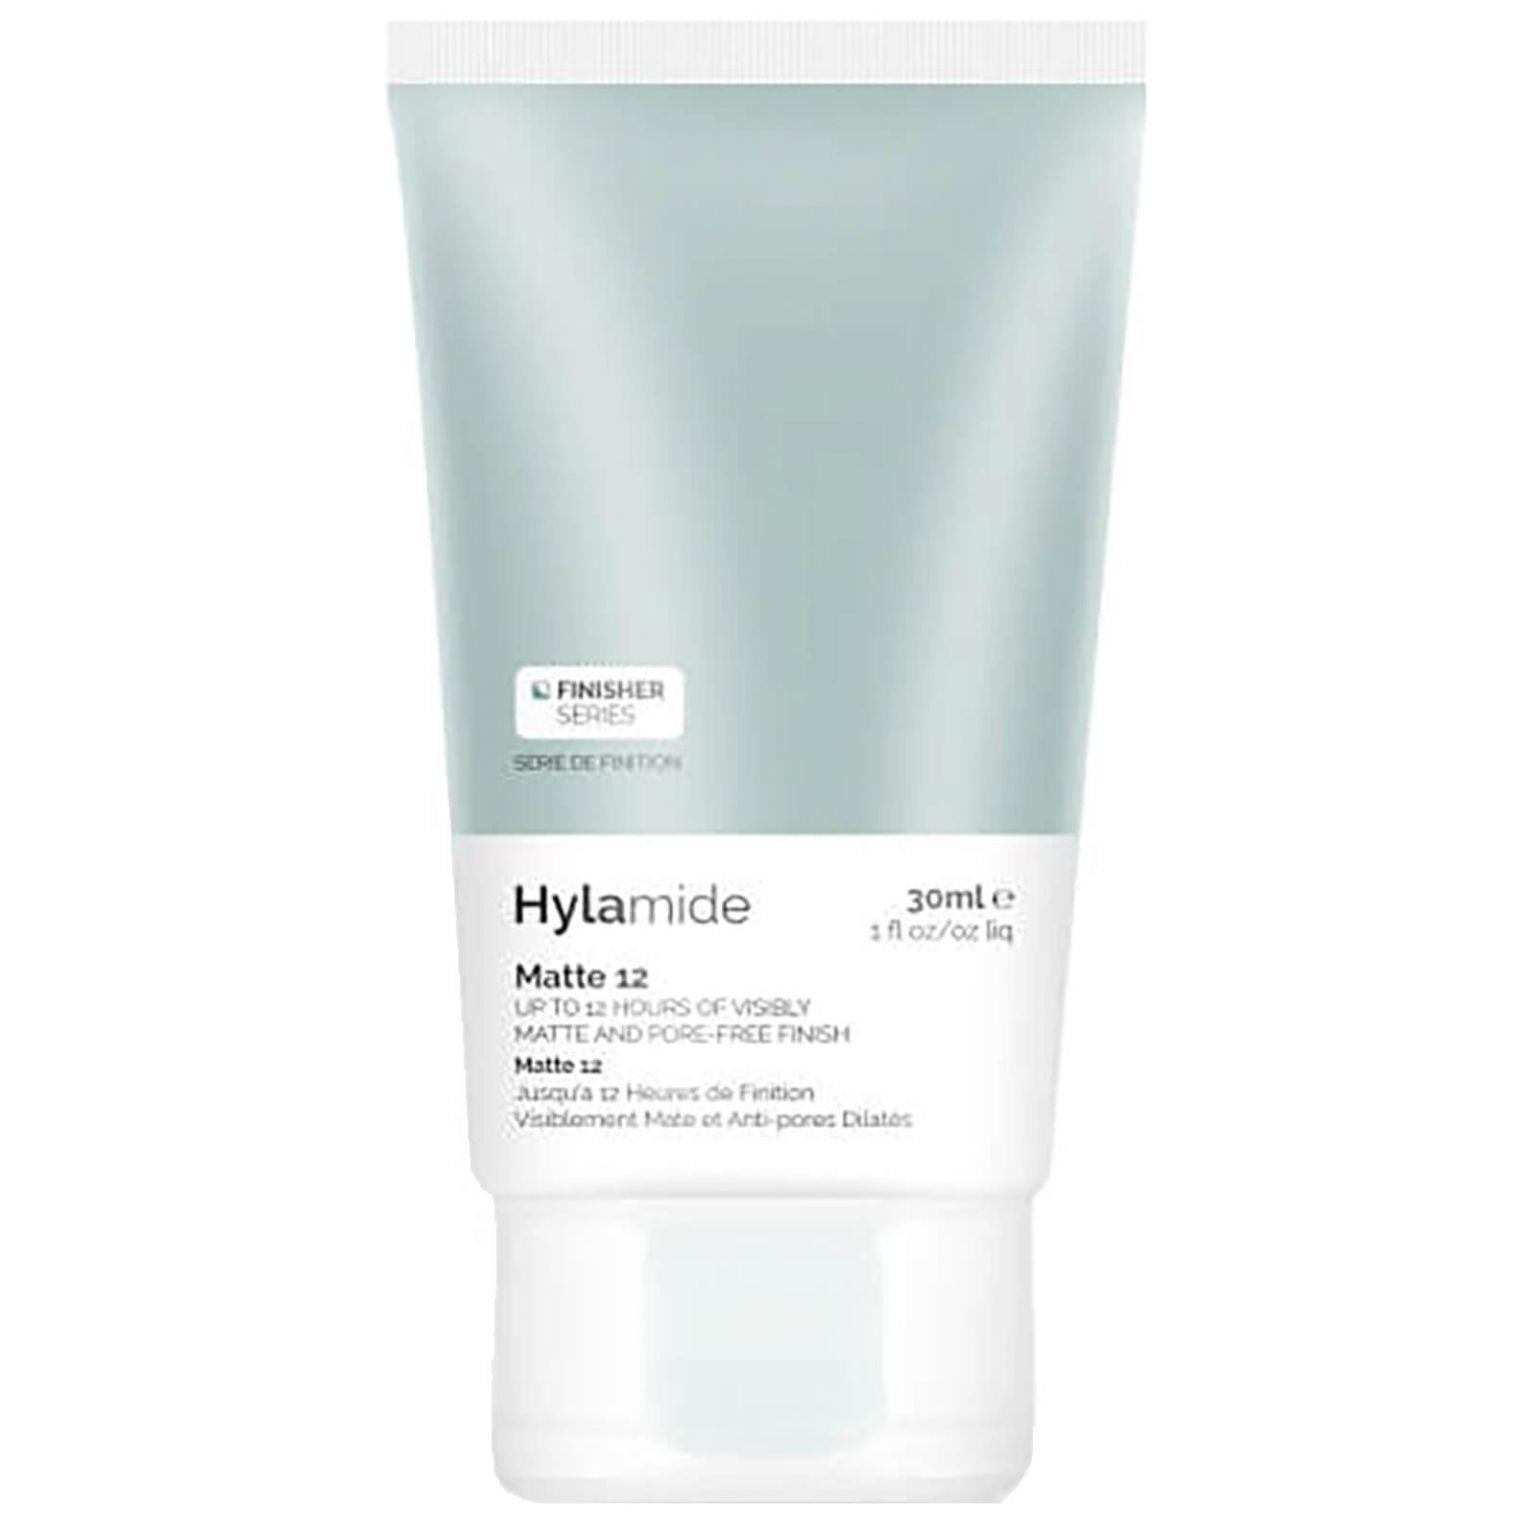 Hylamide - Finisher Matte 12